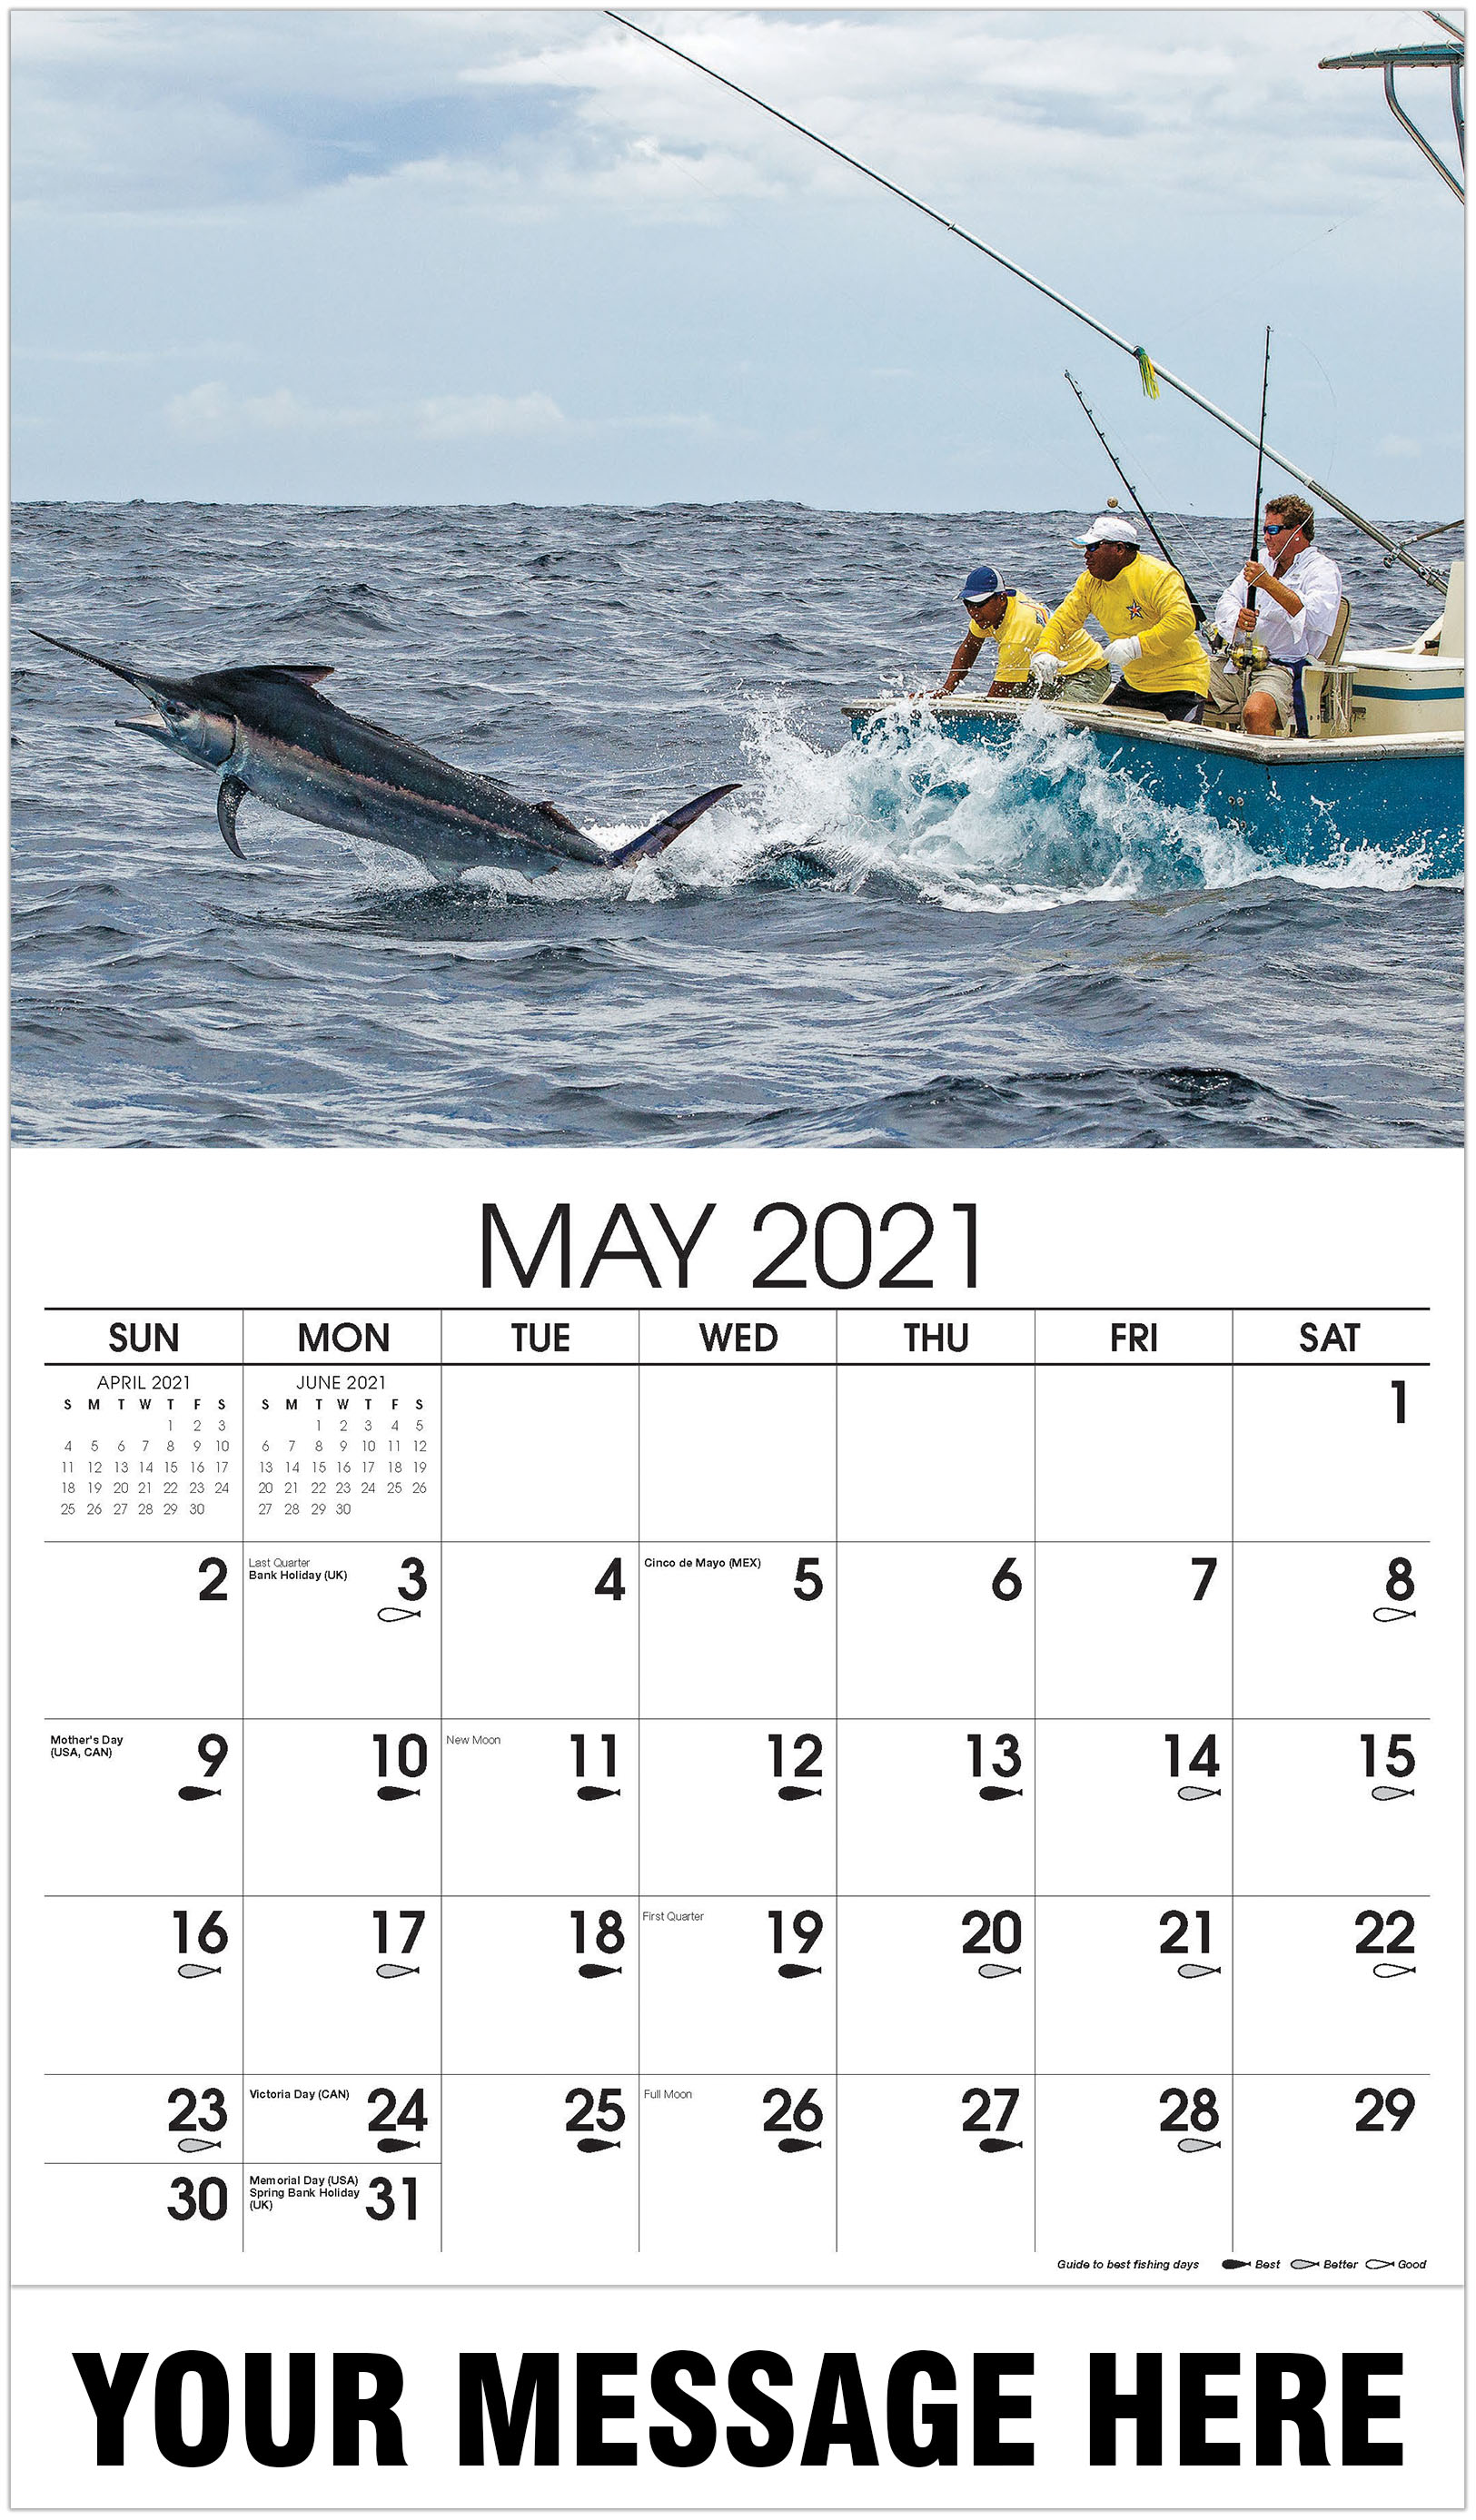 sword fish hunting - May - Fishing & Hunting 2021 Promotional Calendar